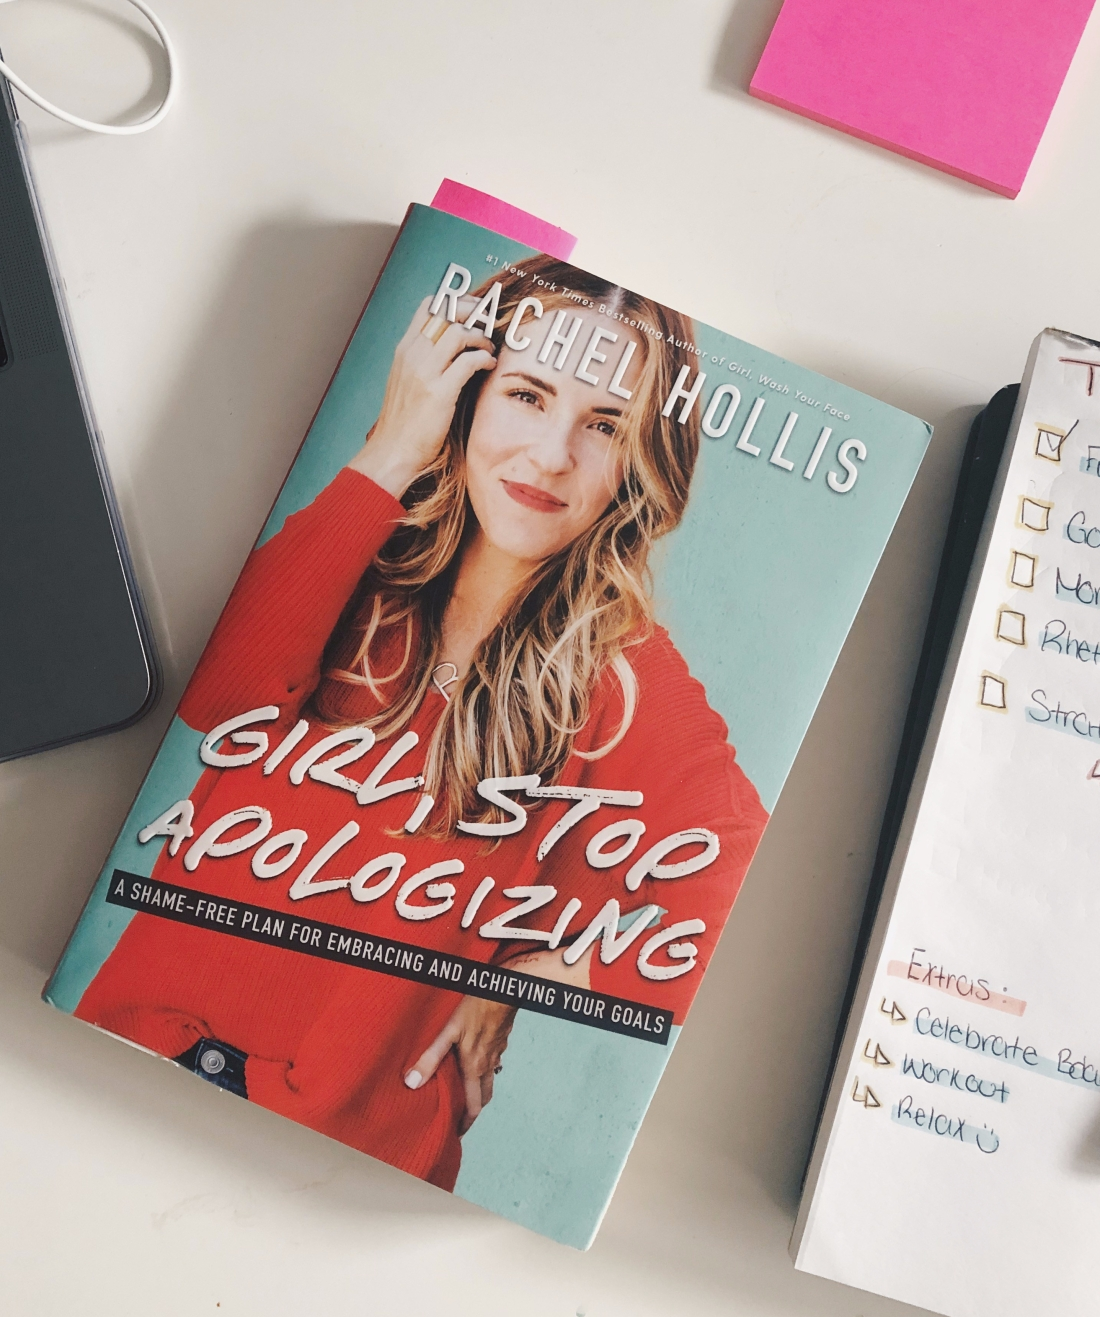 Girl, Stop Apologizing by Rachel Hollis Book